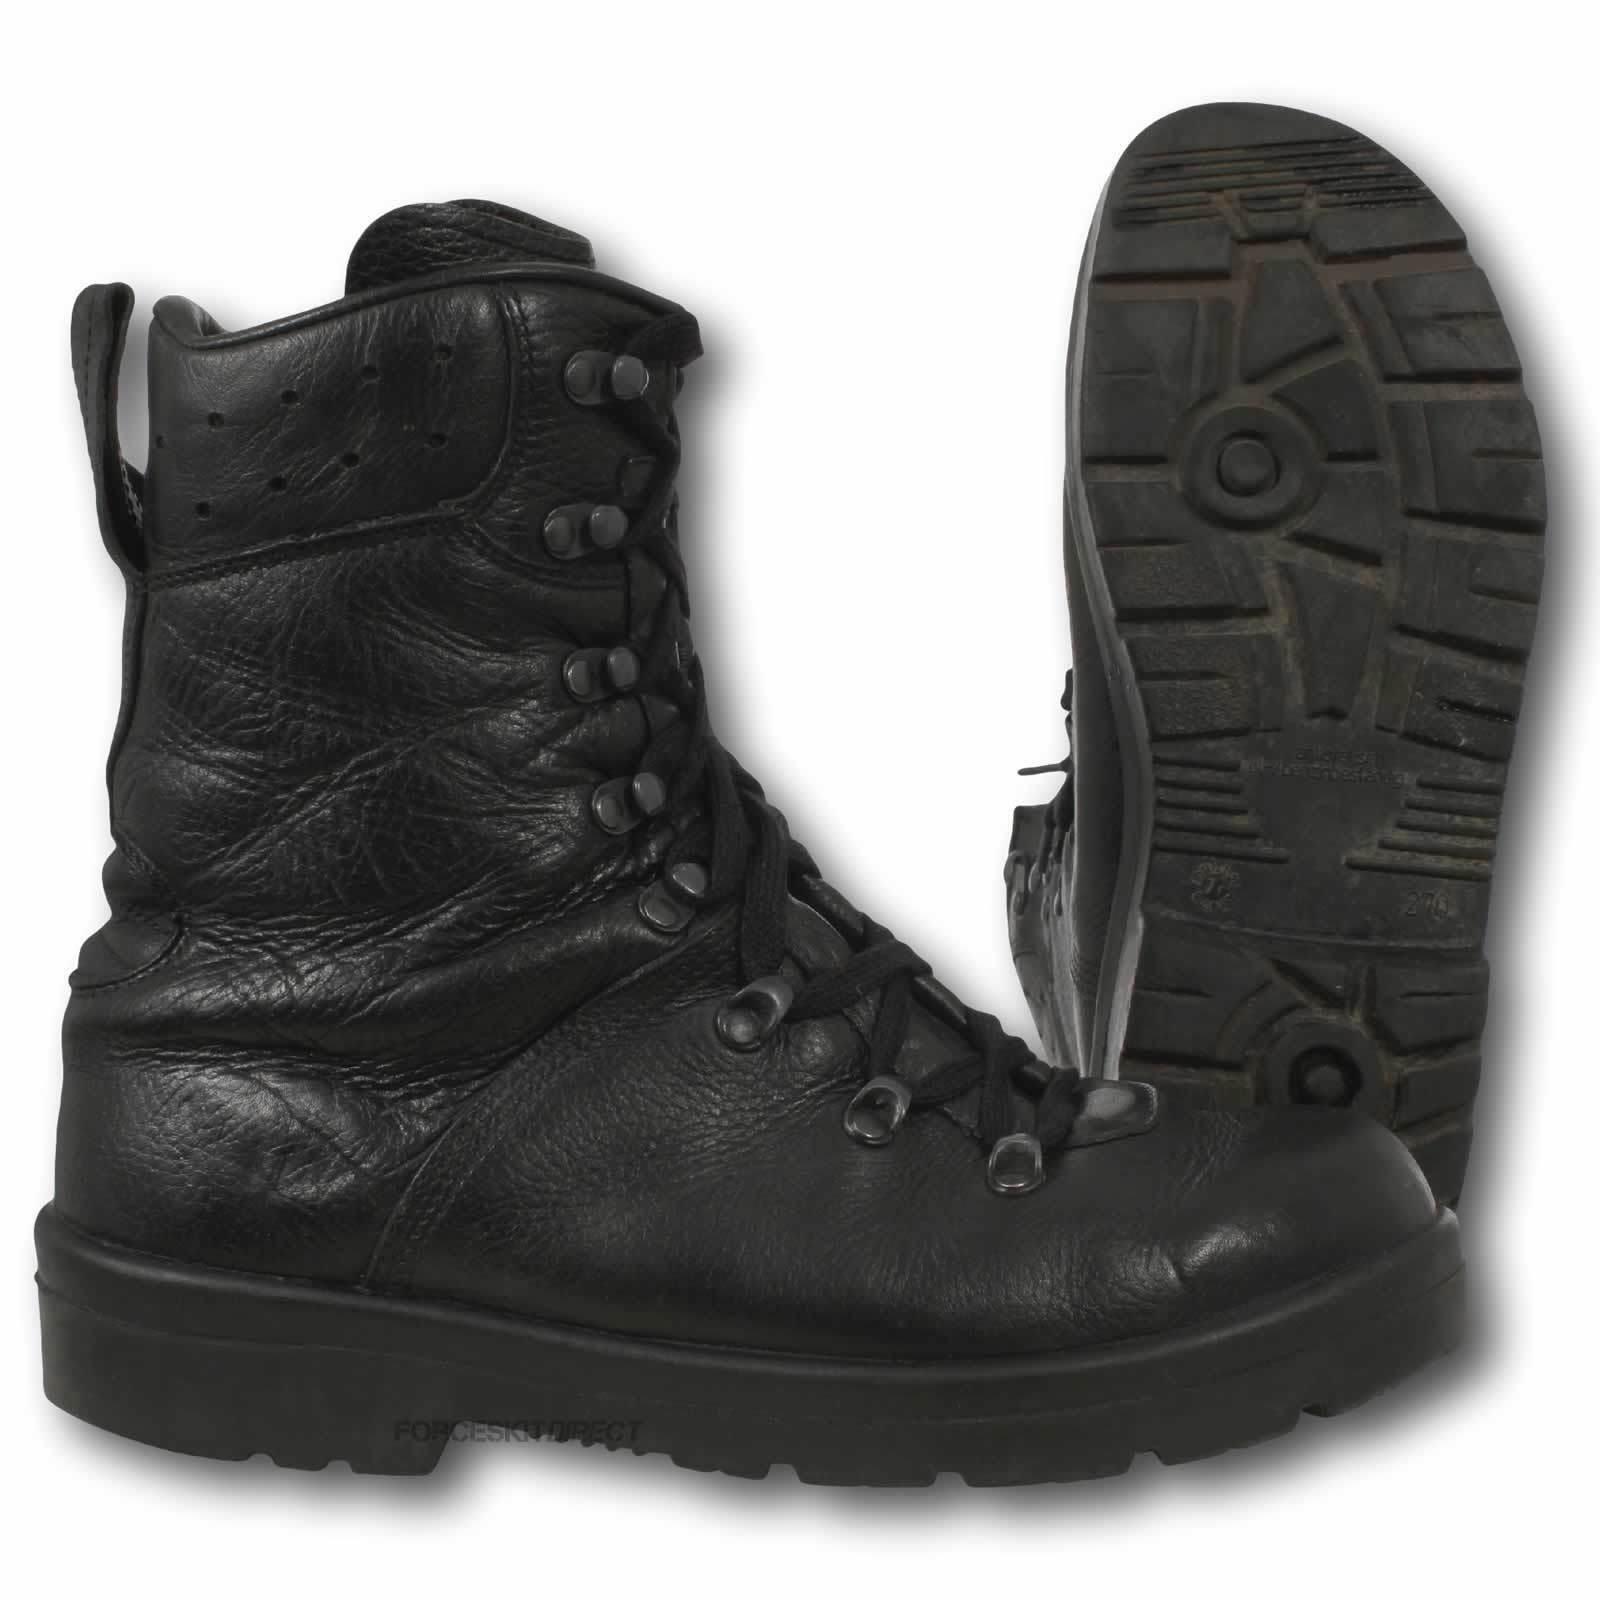 German Army Para Boots Genuine Military Surplus Black Leather Paratrooper Combat